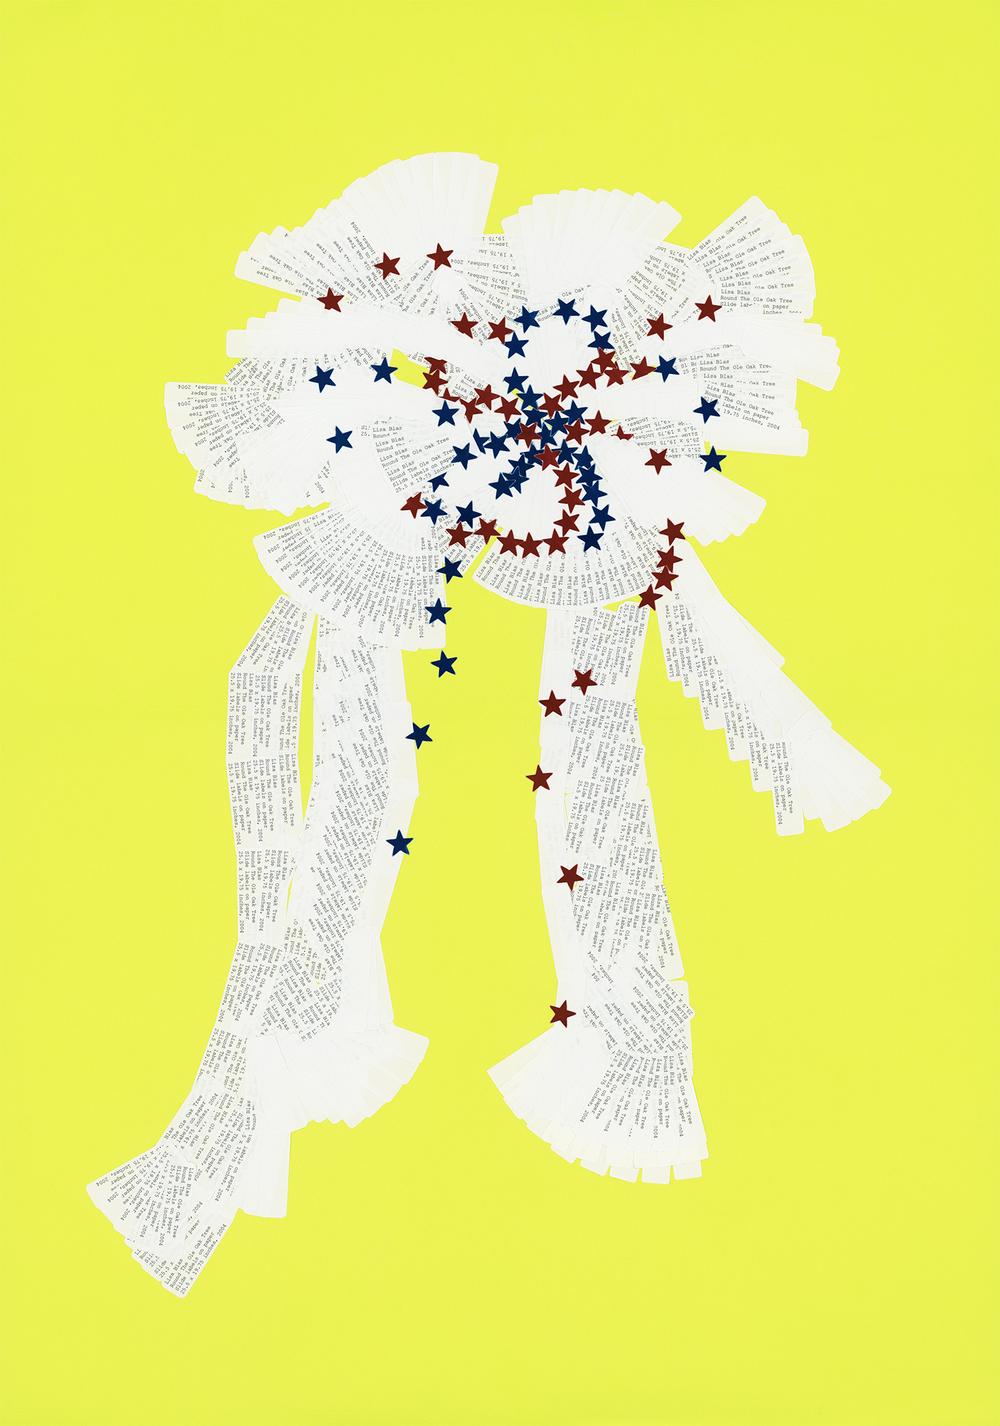 Yellow Ribbon  Chromogenic print 26 x 20 inches 2004